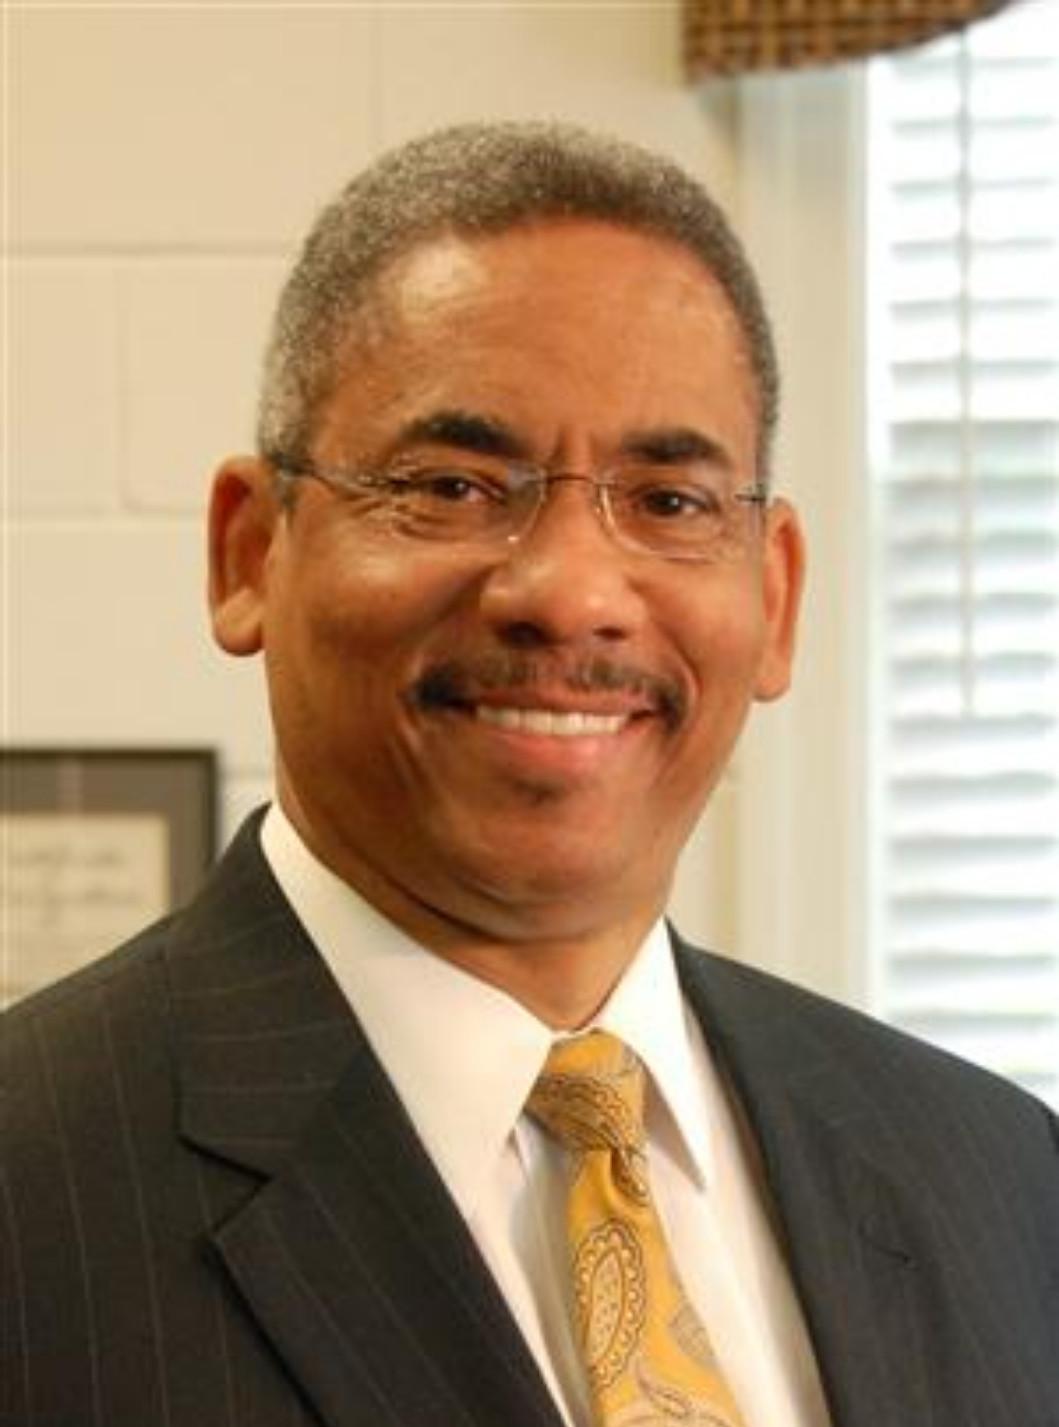 Dr. Dorwin L. Howard, Sr. - Superintendent